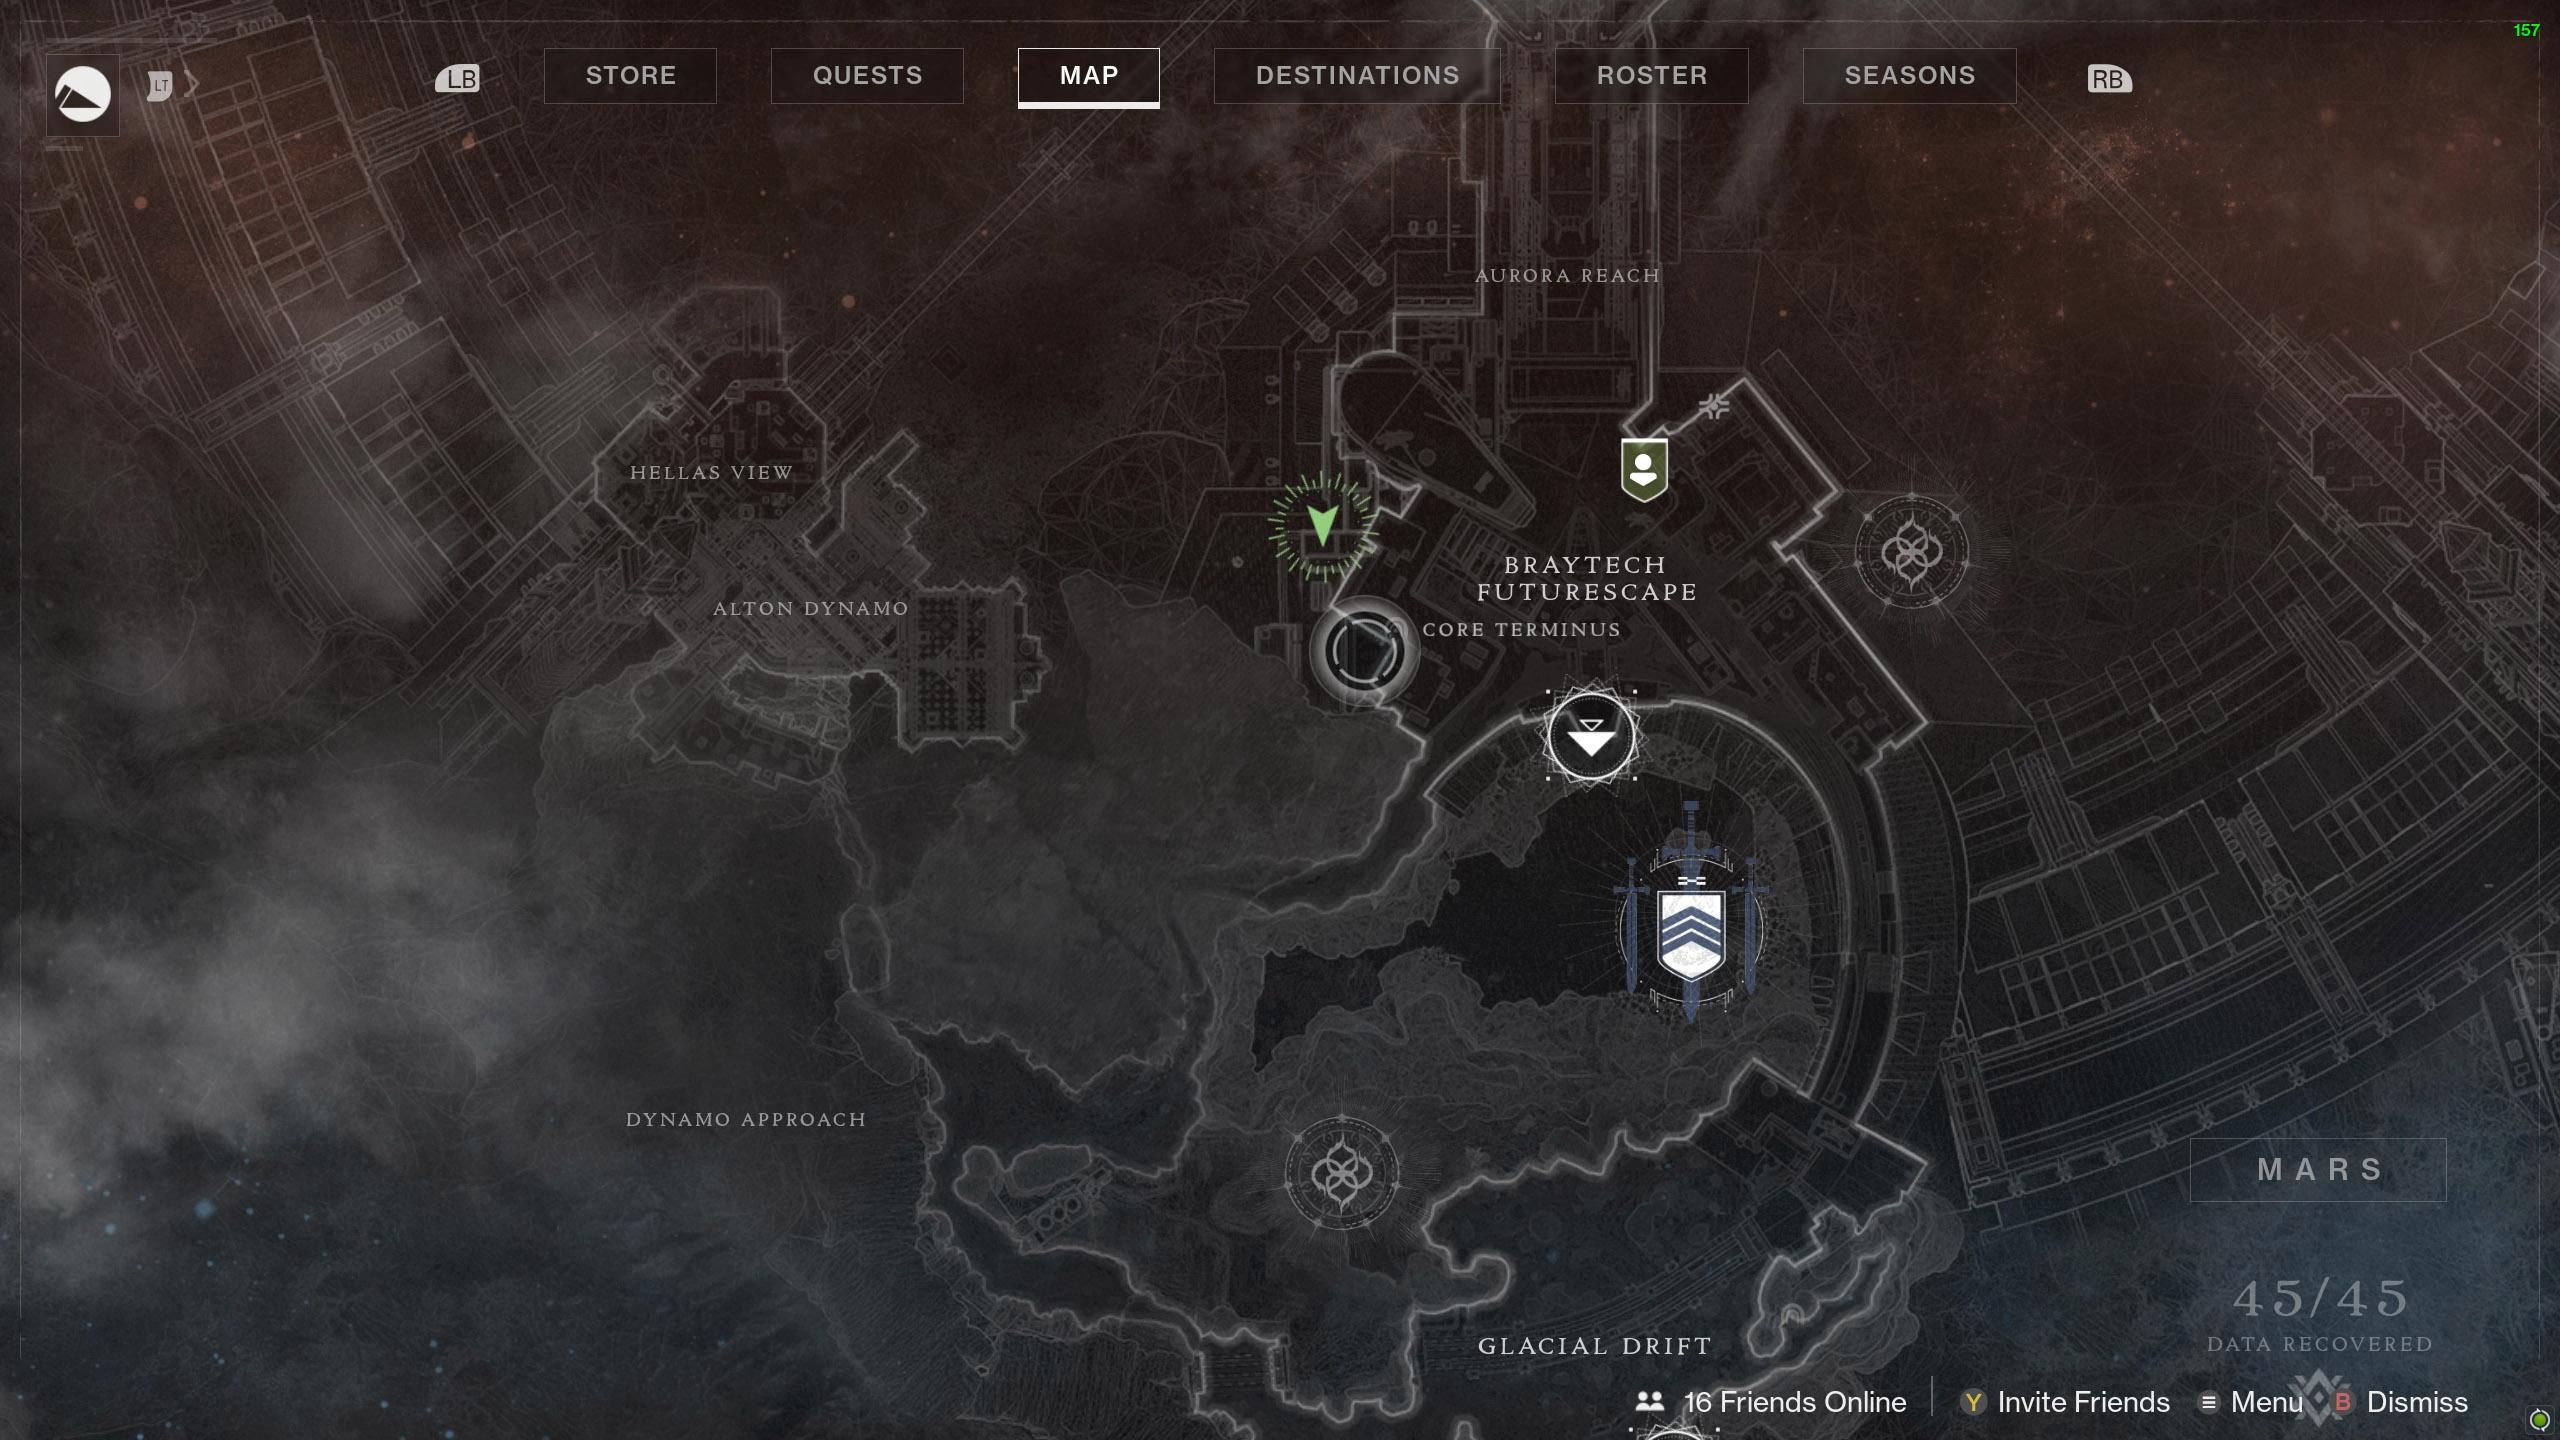 Destiny 2 Savathuns Eyes Mars Core Terminus map